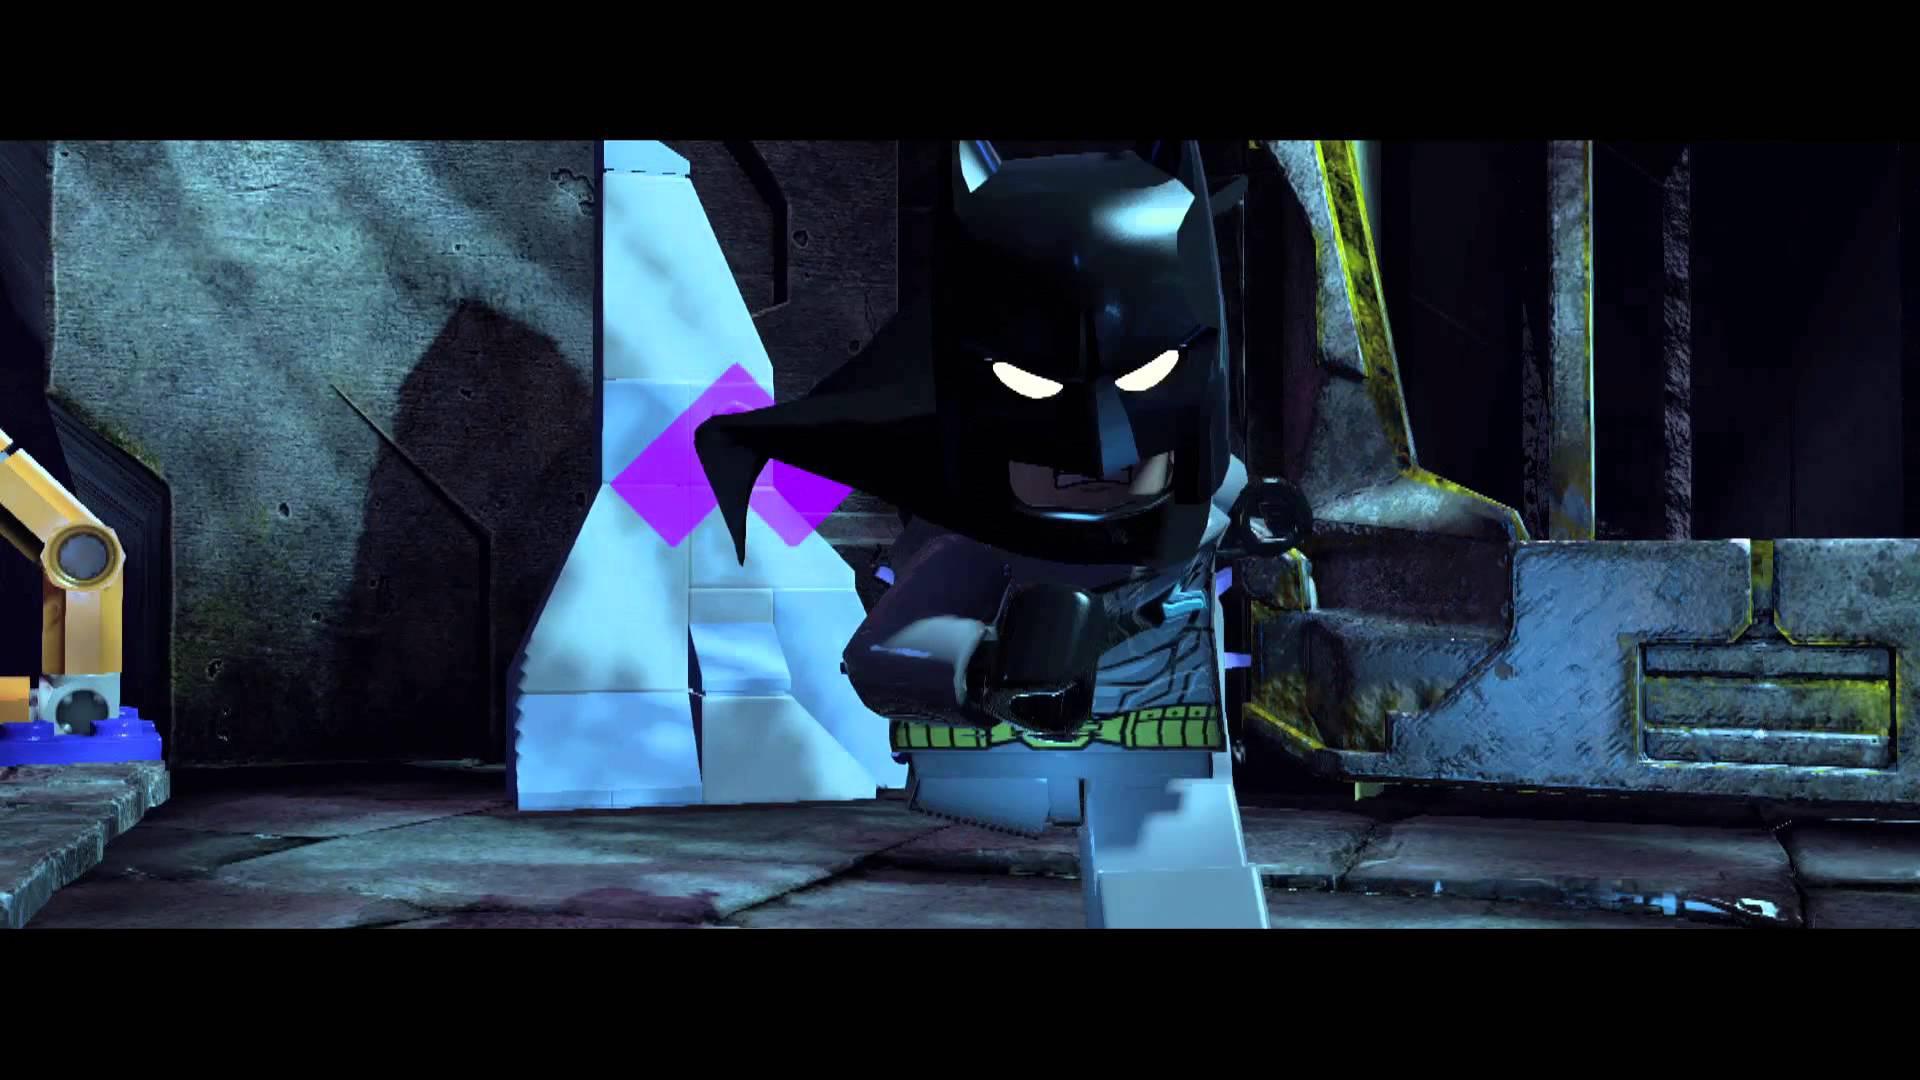 Lego Batman 3: Beyond Gotham primește trailer oficial în cadrul SDCC 2014